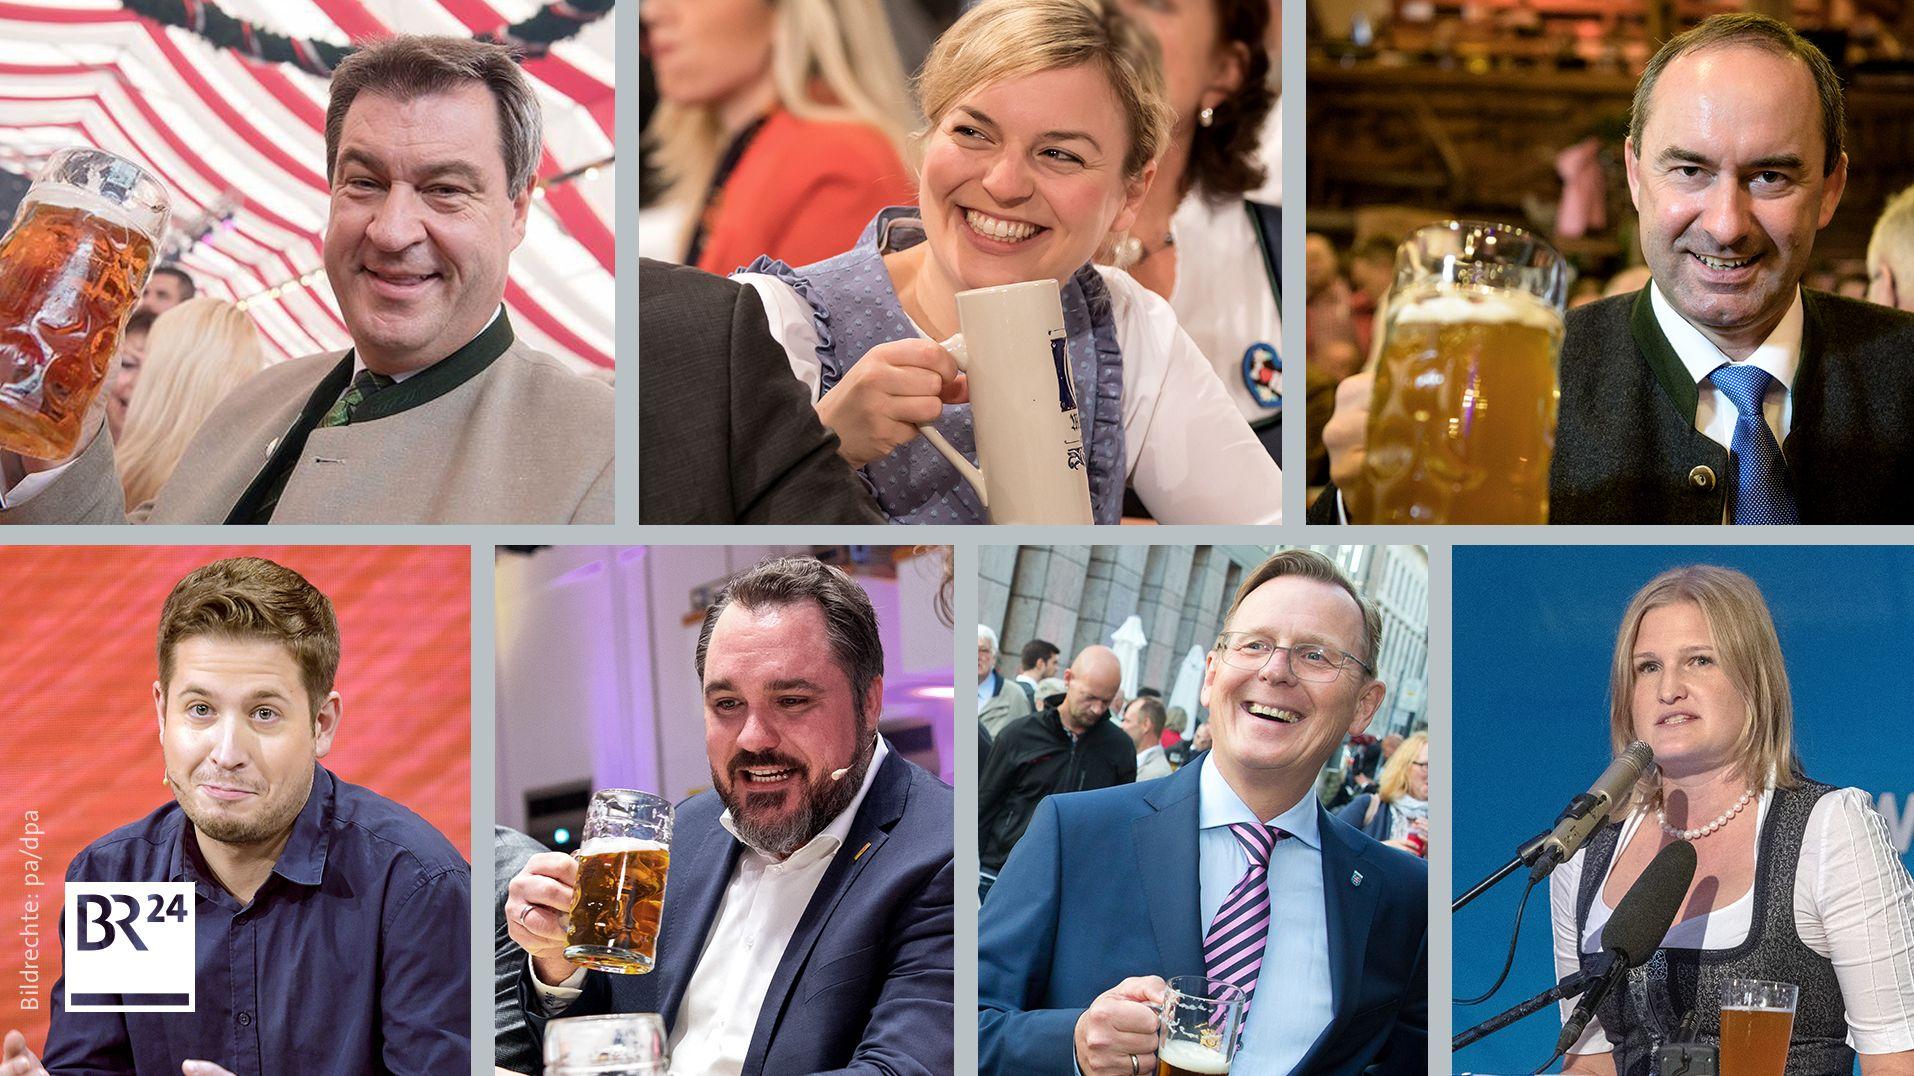 Gillamoos-Redner: Markus Söder, Katharina Schulze, Hubert Aiwanger, Kevin Kühnert, Daniel Föst, Bodo Ramelow, Katrin Ebner-Steiner